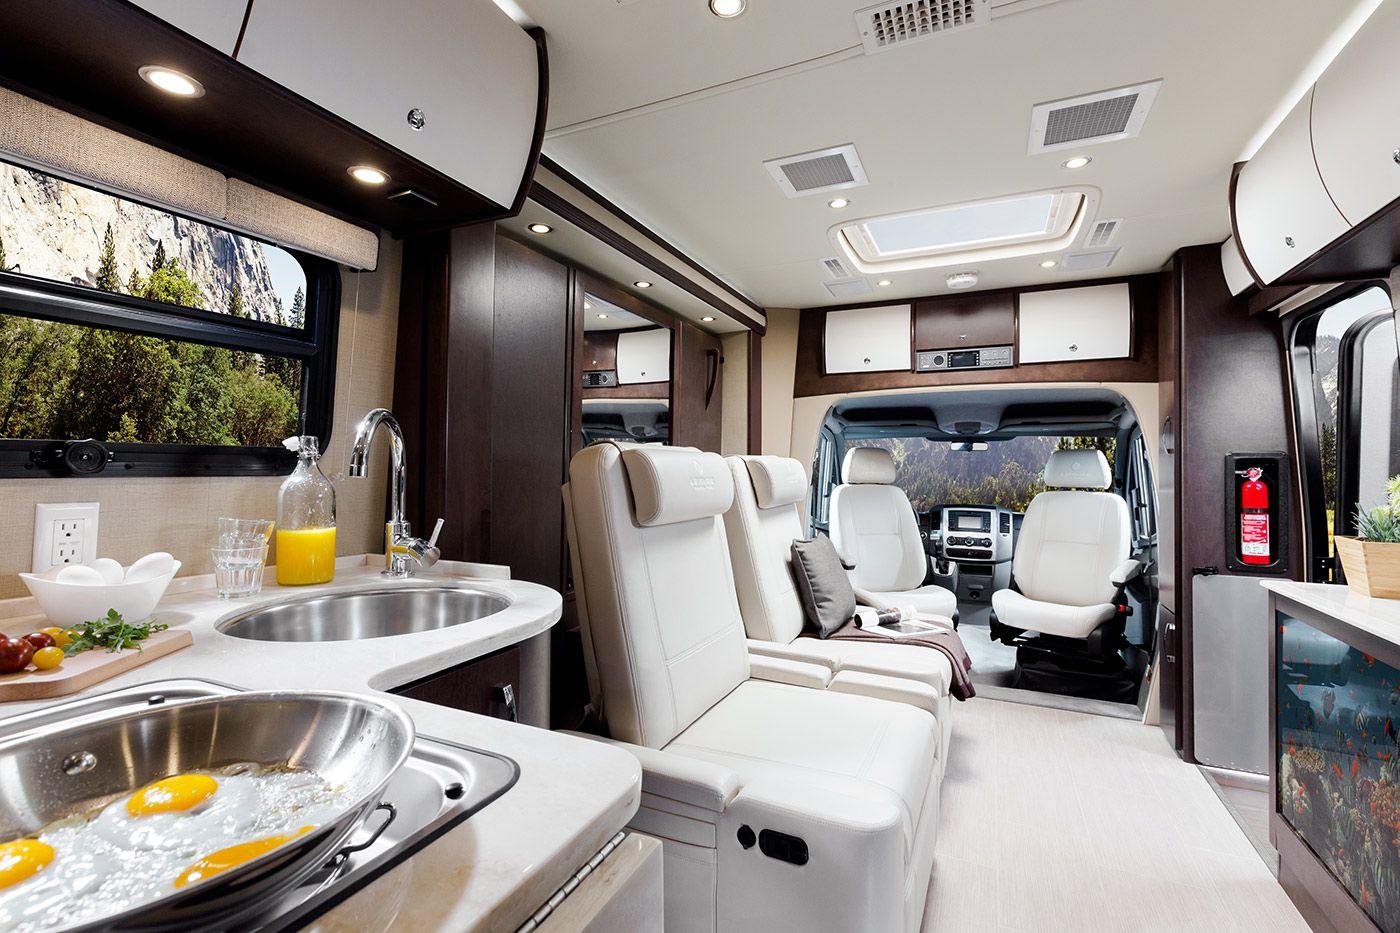 Motorhome Interior Design Leisure Travel Van Unity 24Bm  Leisure Travel Unity Murphy Bed